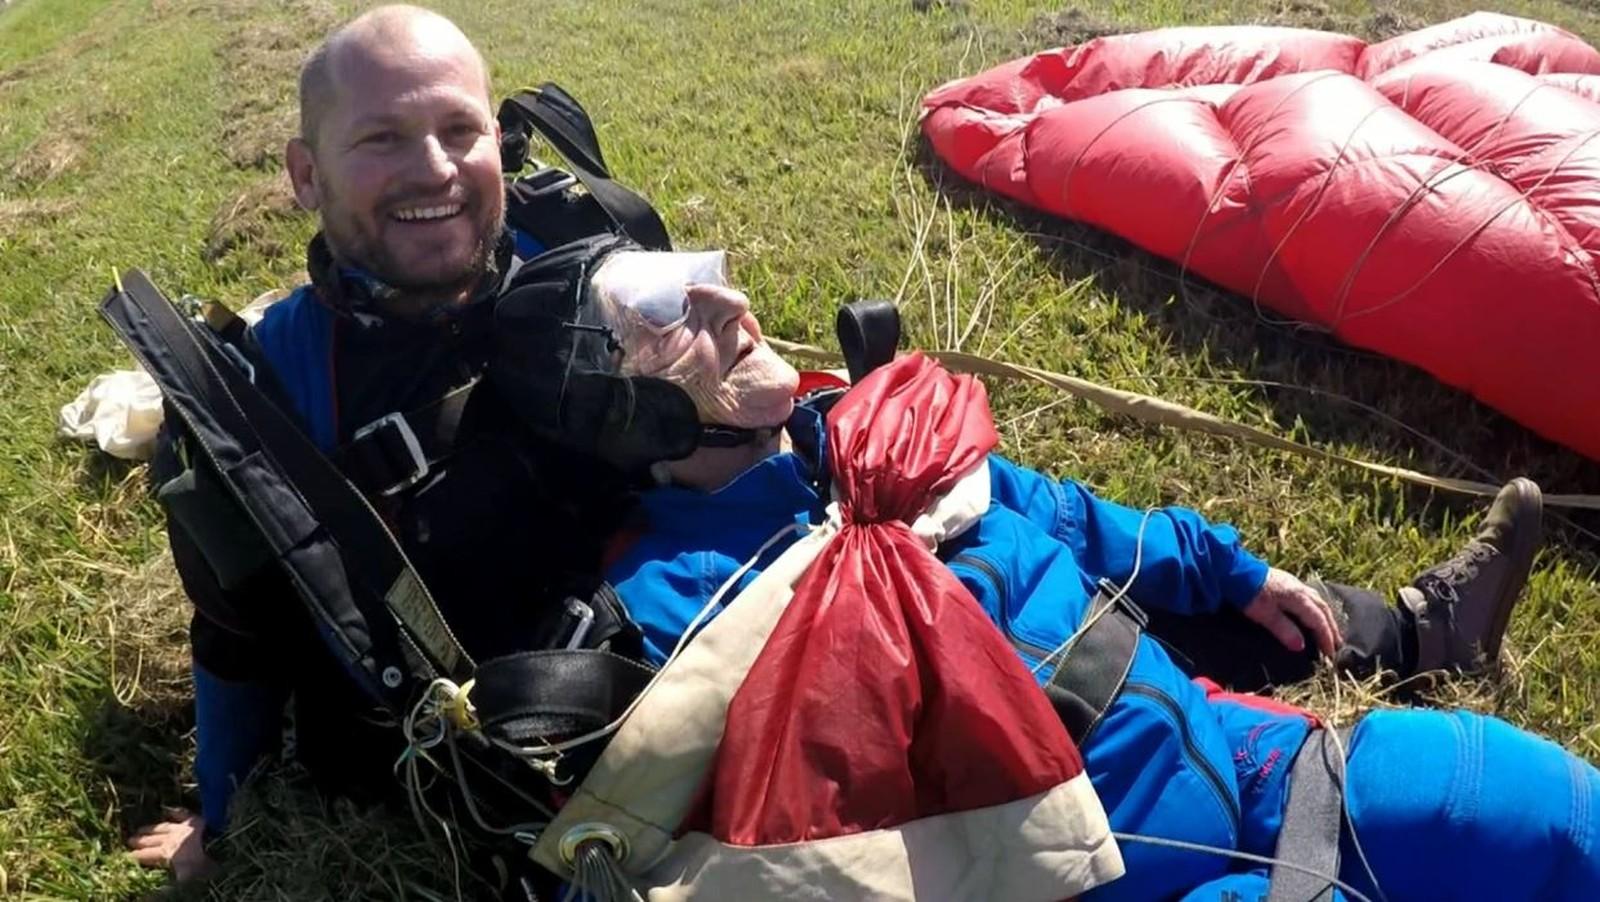 Tataravó salta de paraquedas